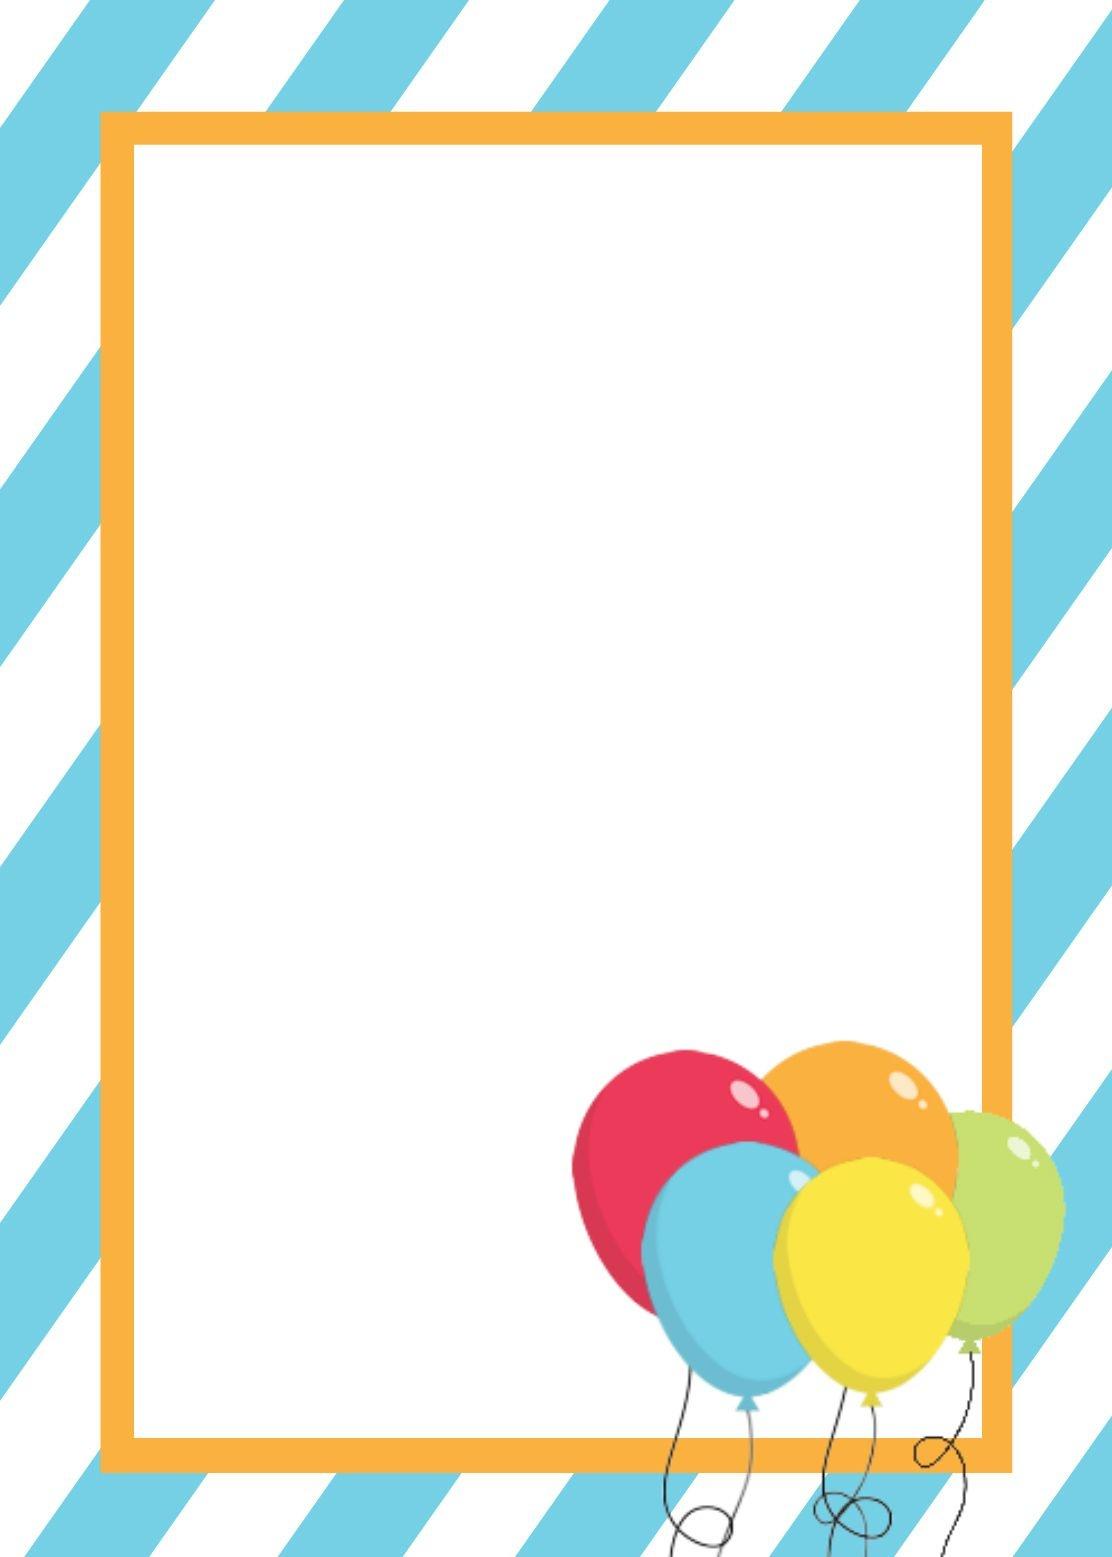 Free Printable Birthday Invitation Templates   Birthday Ideas And - Happy Birthday Invitations Free Printable